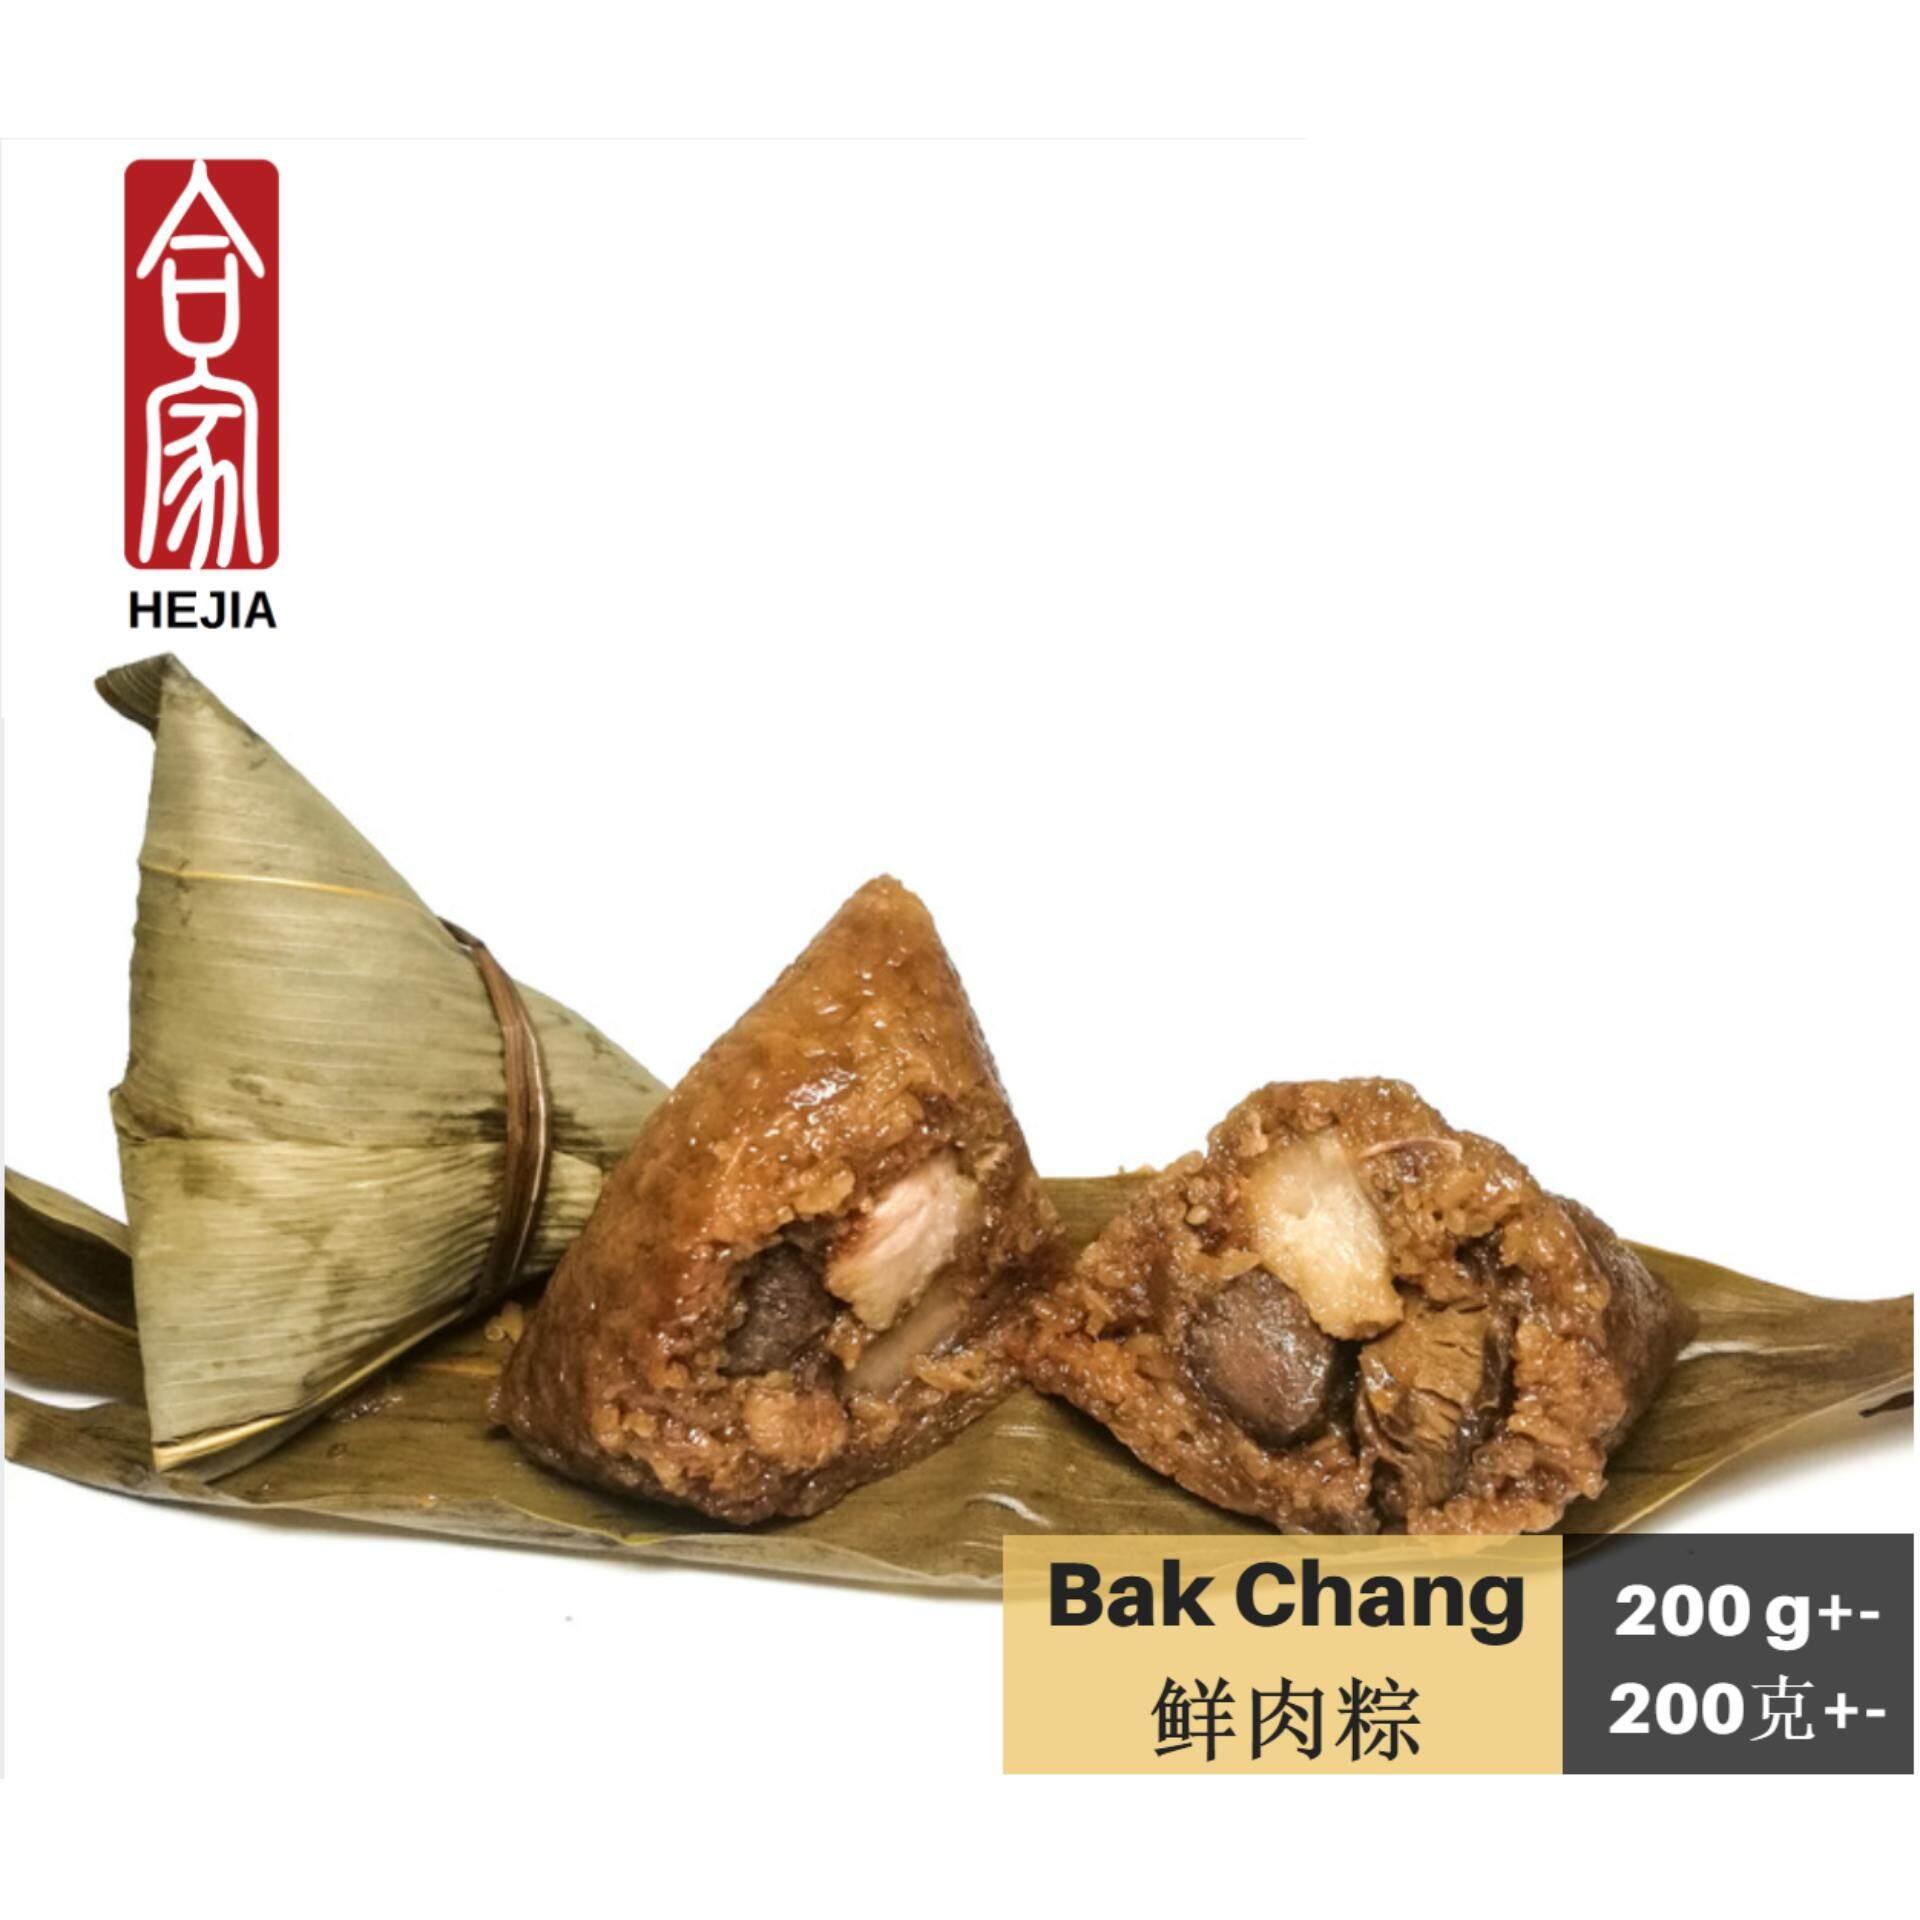 HEJIA Bak Chang Rice Dumpling   [Vacuum Pack] 3PCS